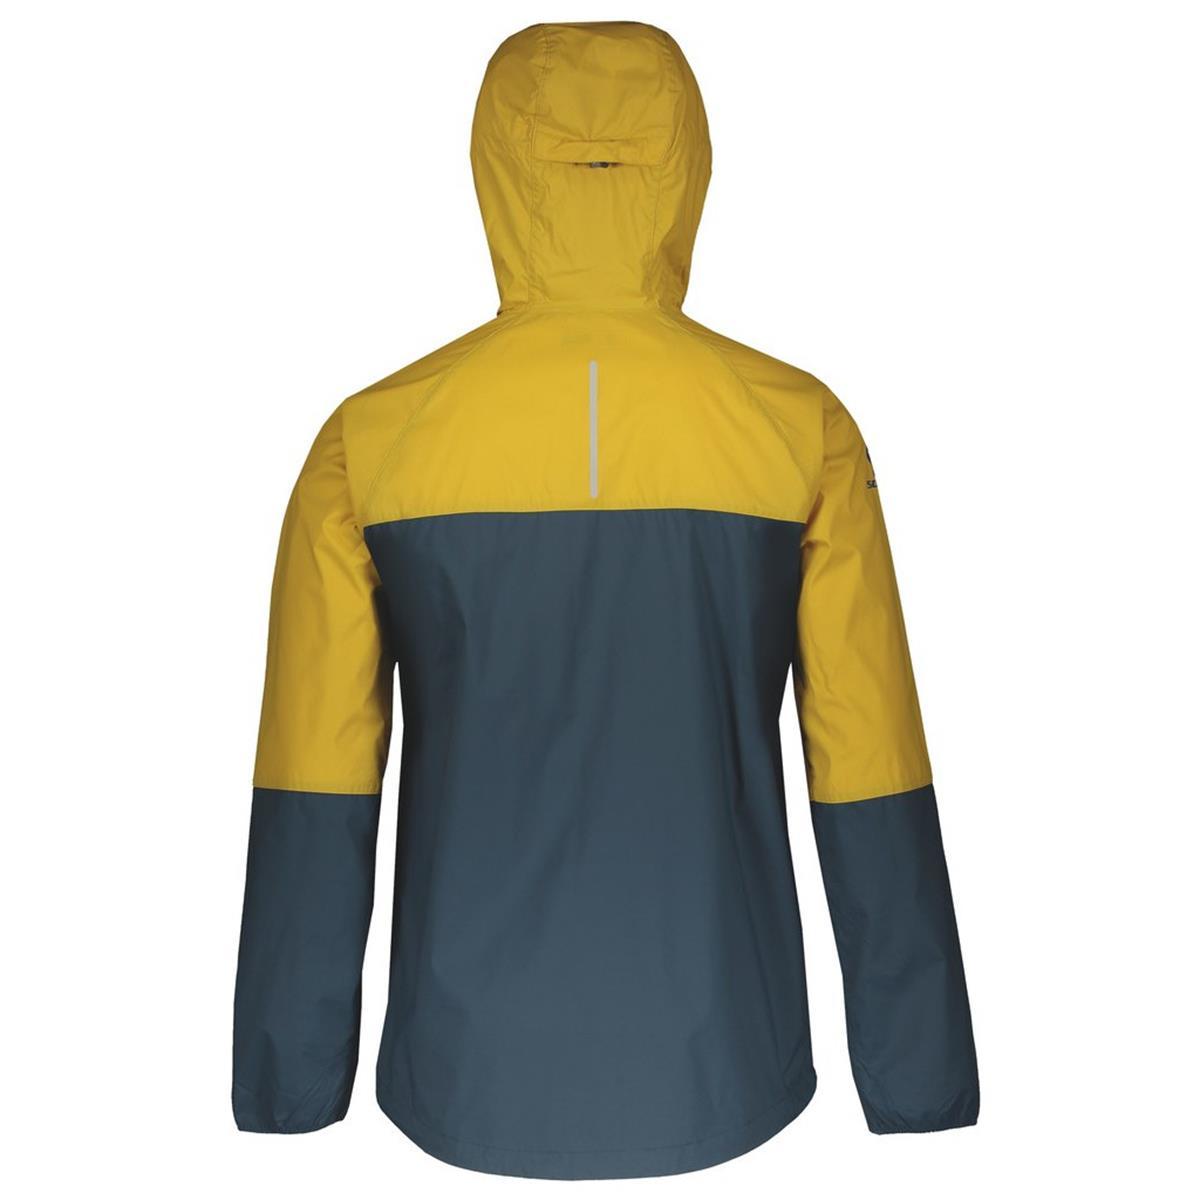 Blue Scott Trail MTN Windbreaker 40 Mens Cycling Jacket